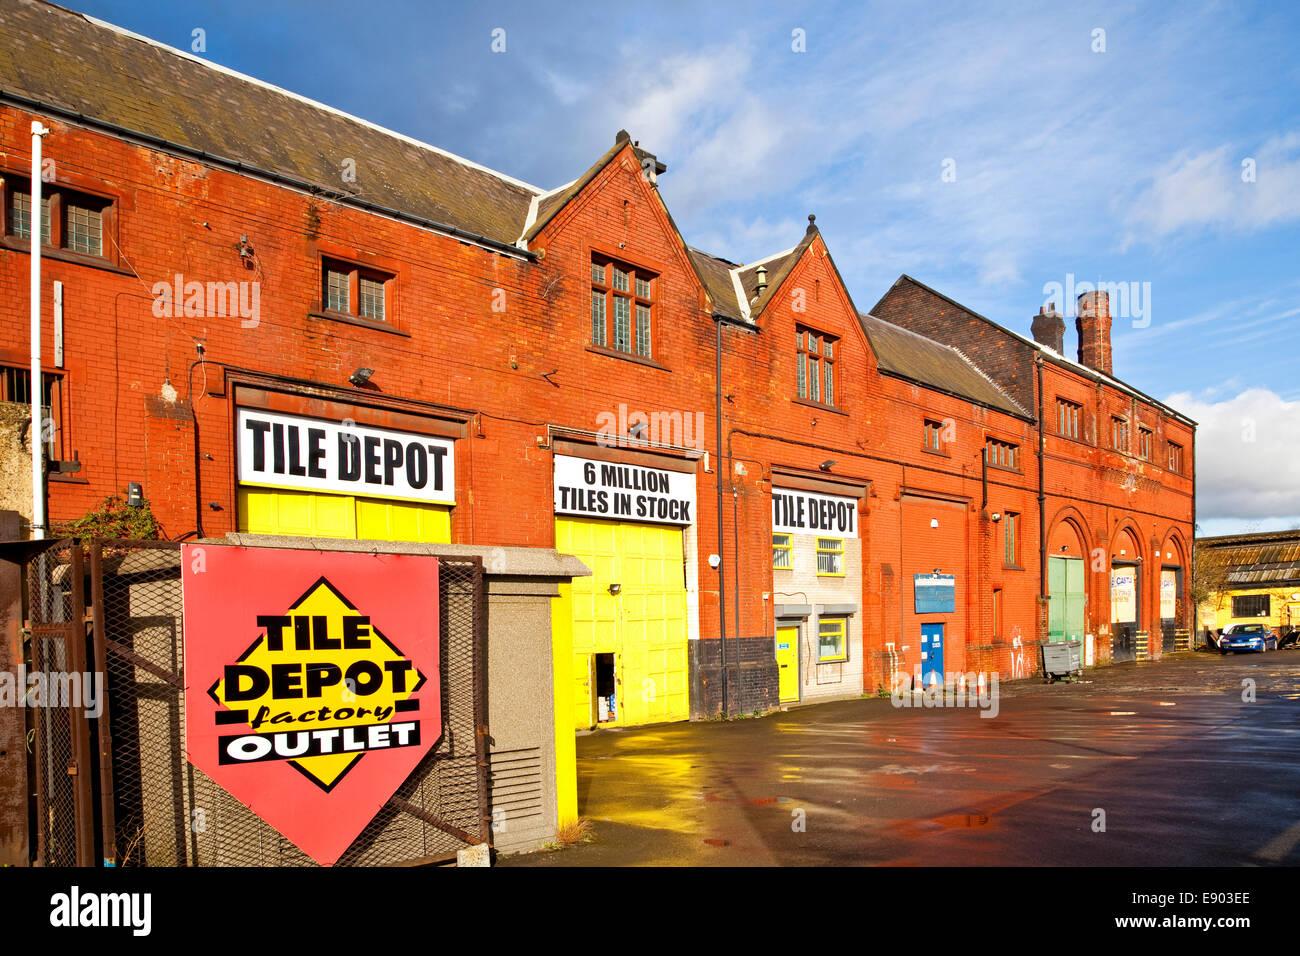 The former Tinsley tram sheds Sheffield South Yorkshire UK - Stock Image